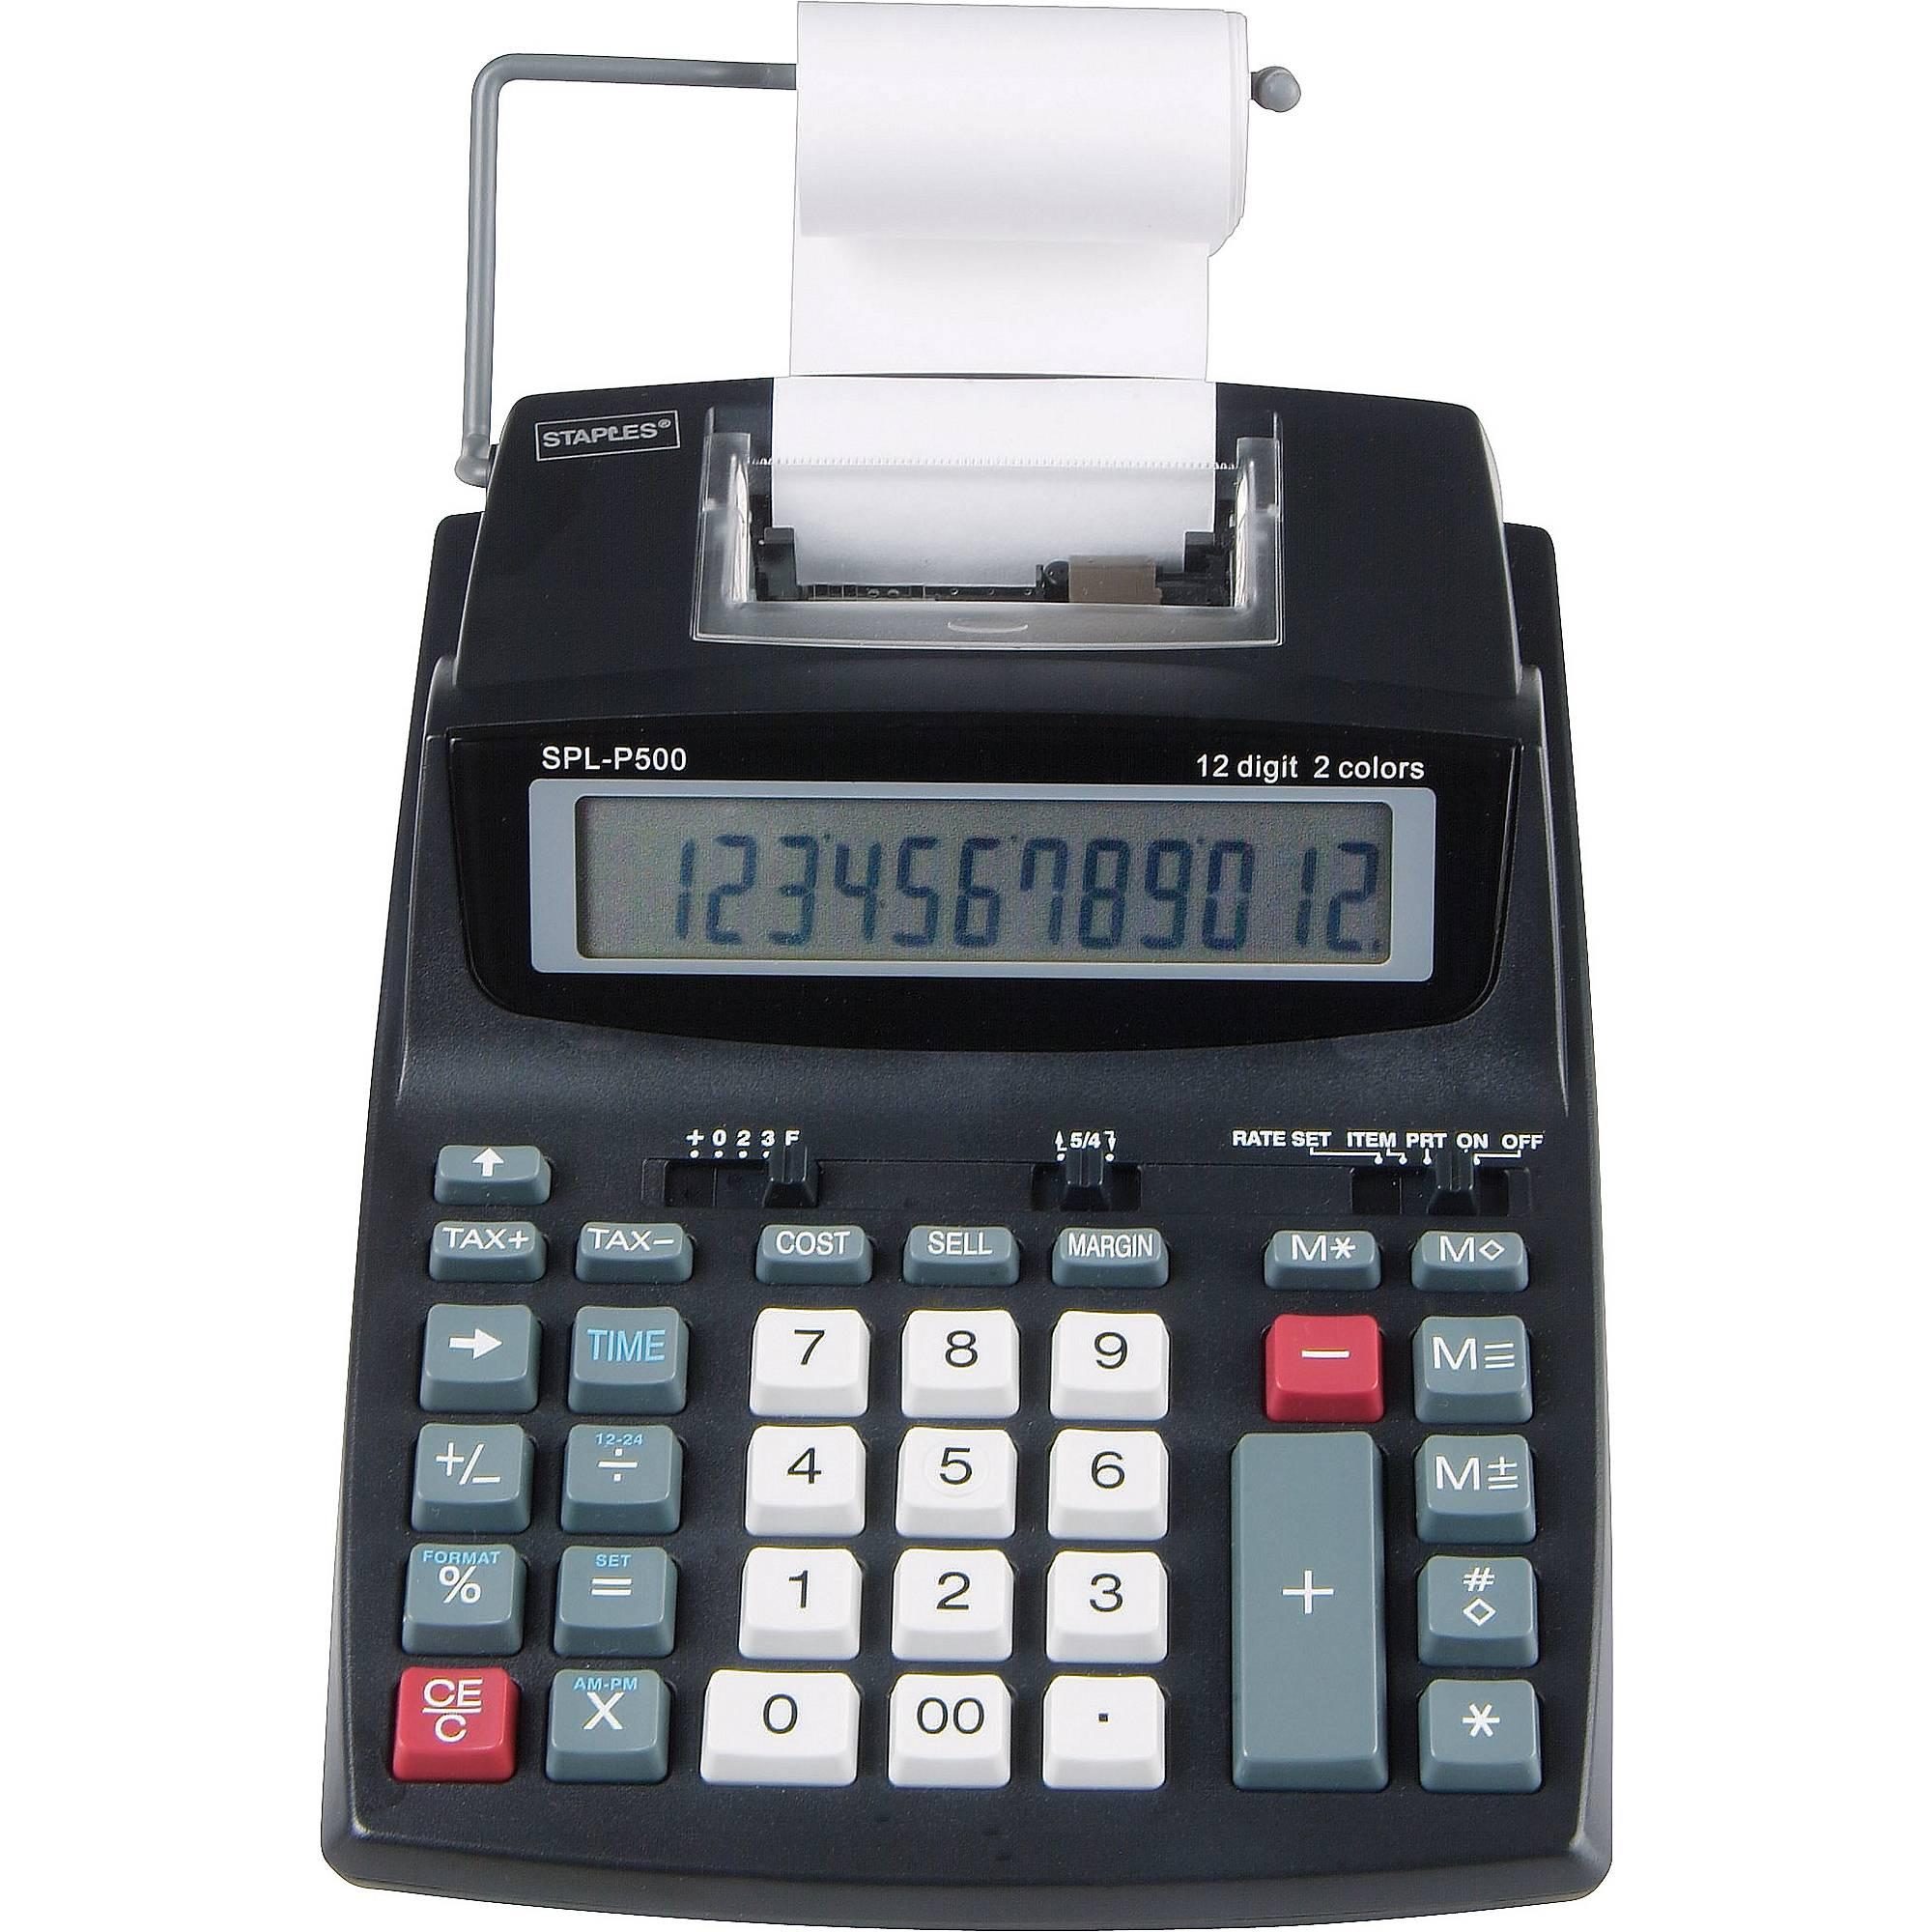 Staples SPL-P500 Printing Calculator